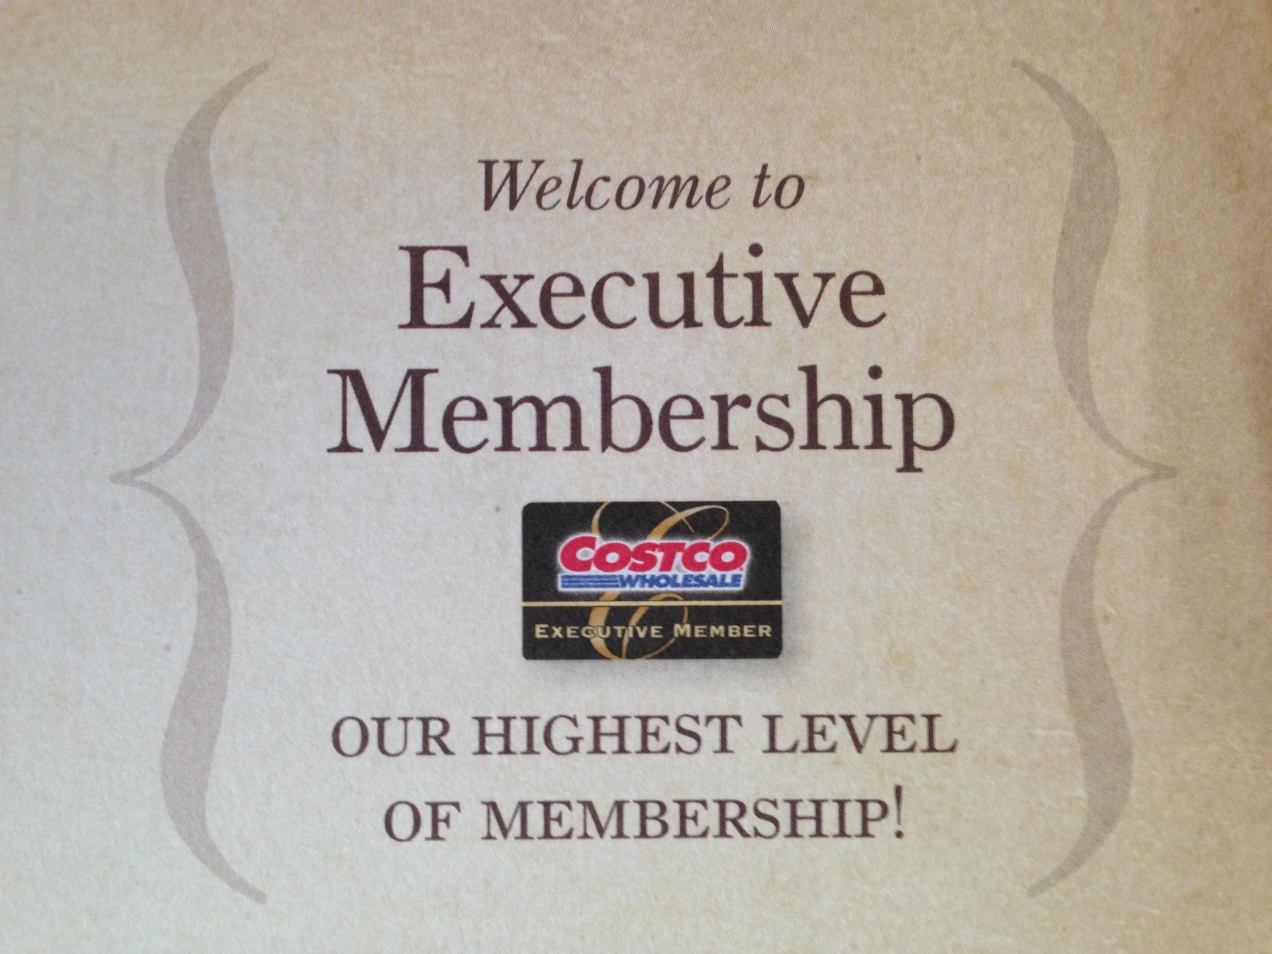 Executive Membership